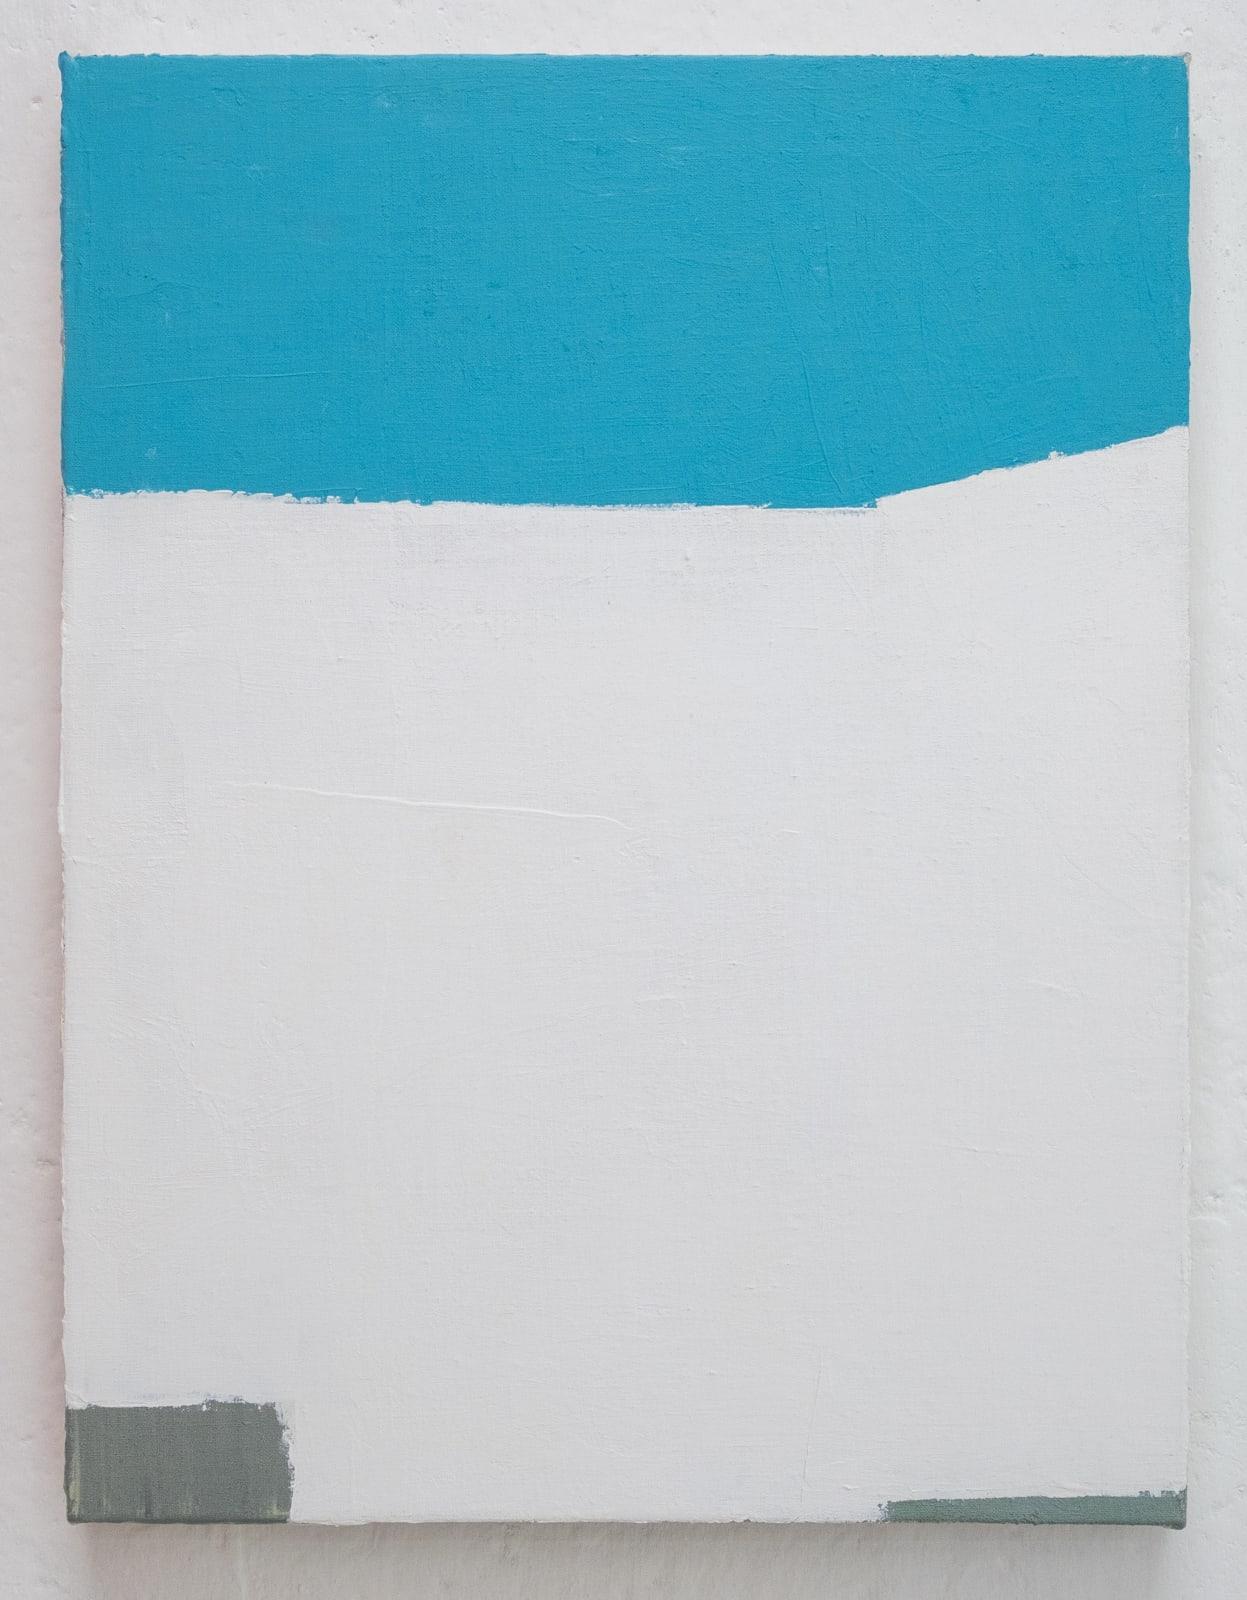 Lai Chih-Sheng 賴志盛 Painting_201904《畫_201904》 2019